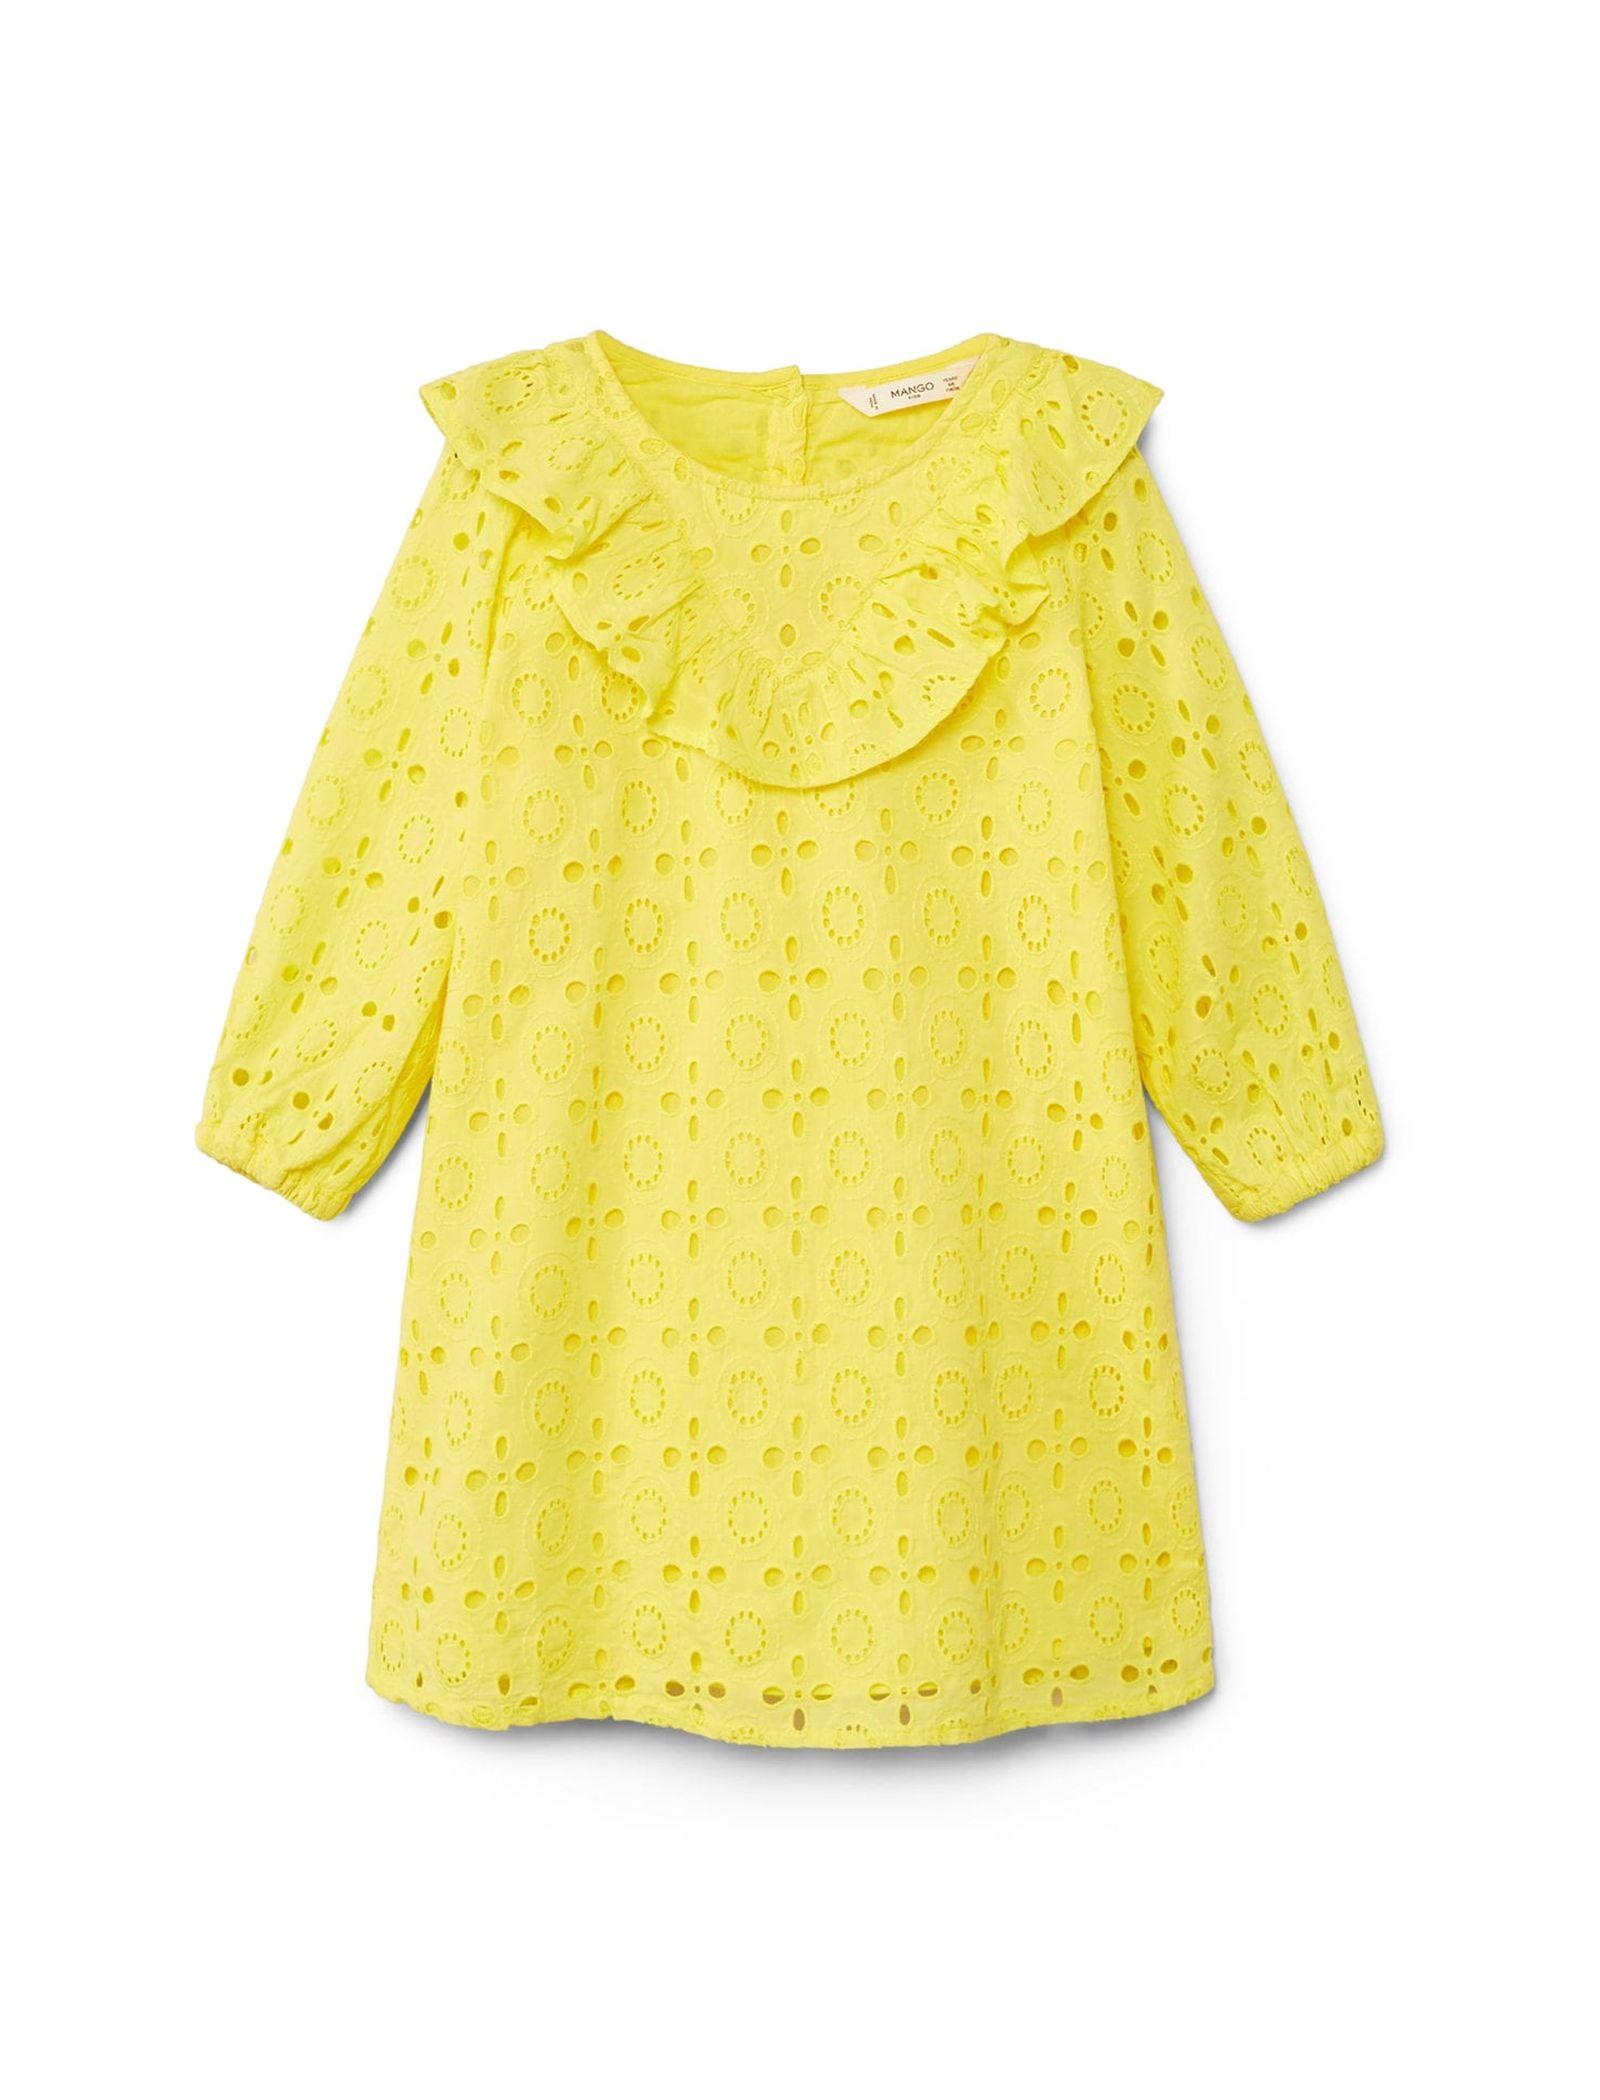 پیراهن نخی روزمره دخترانه - مانگو - زرد  - 1